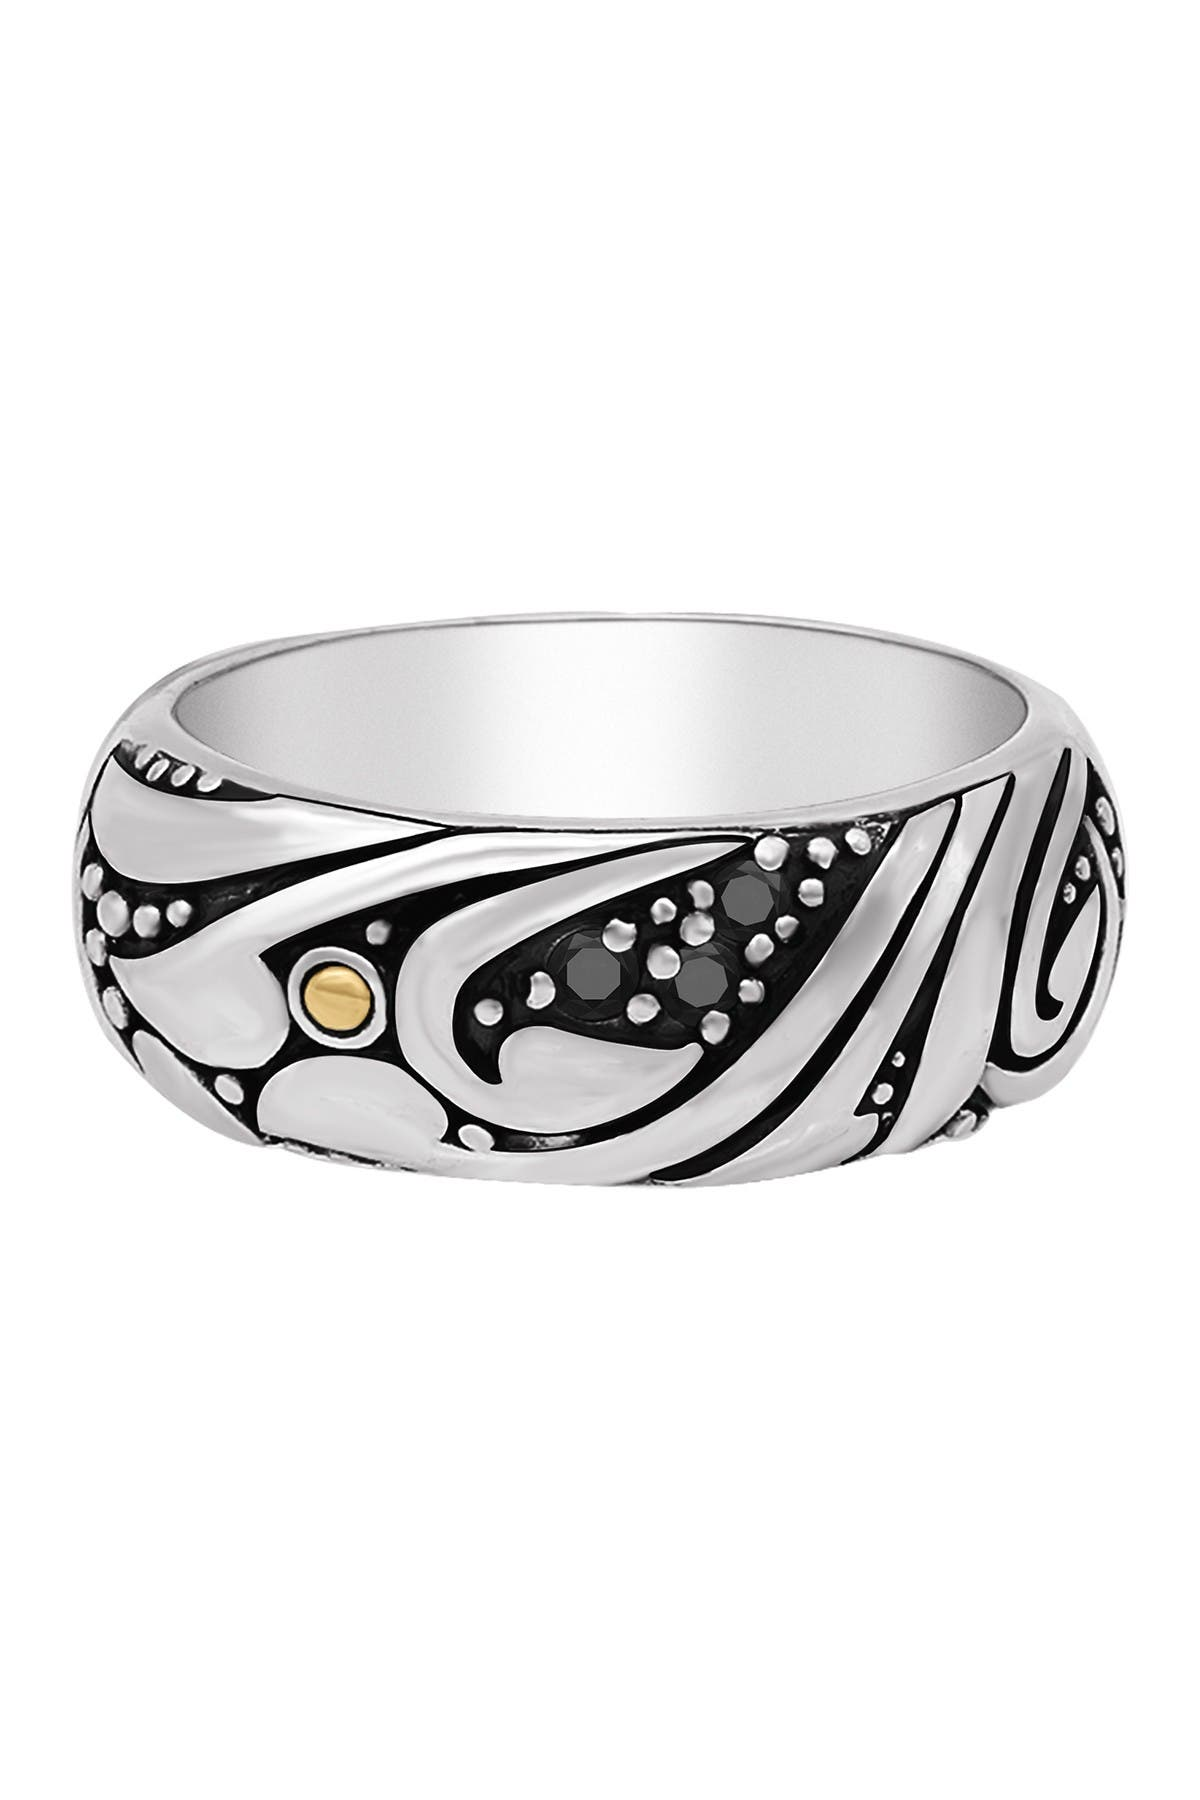 Image of DEVATA Sterling Silver Bali Filigree Black Spinel Dome Ring